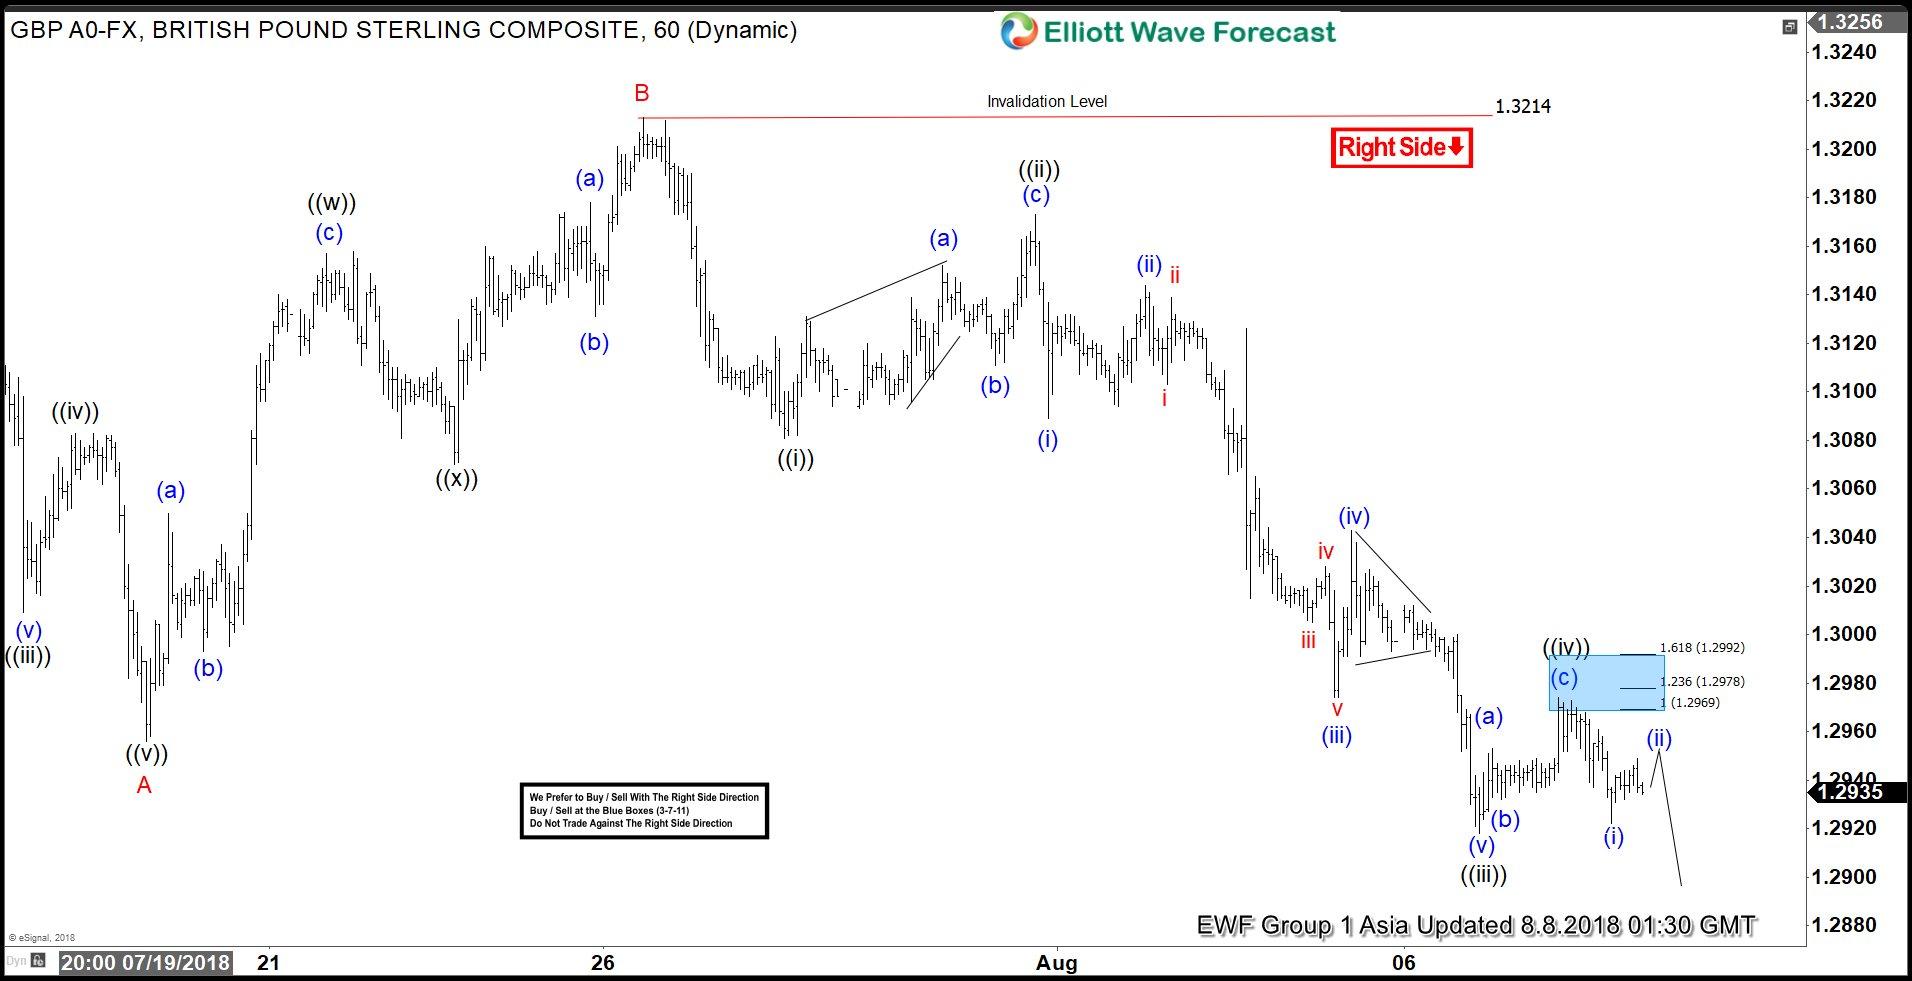 GBPUSD Elliott Wave Analysis: Right Side Calling Lower